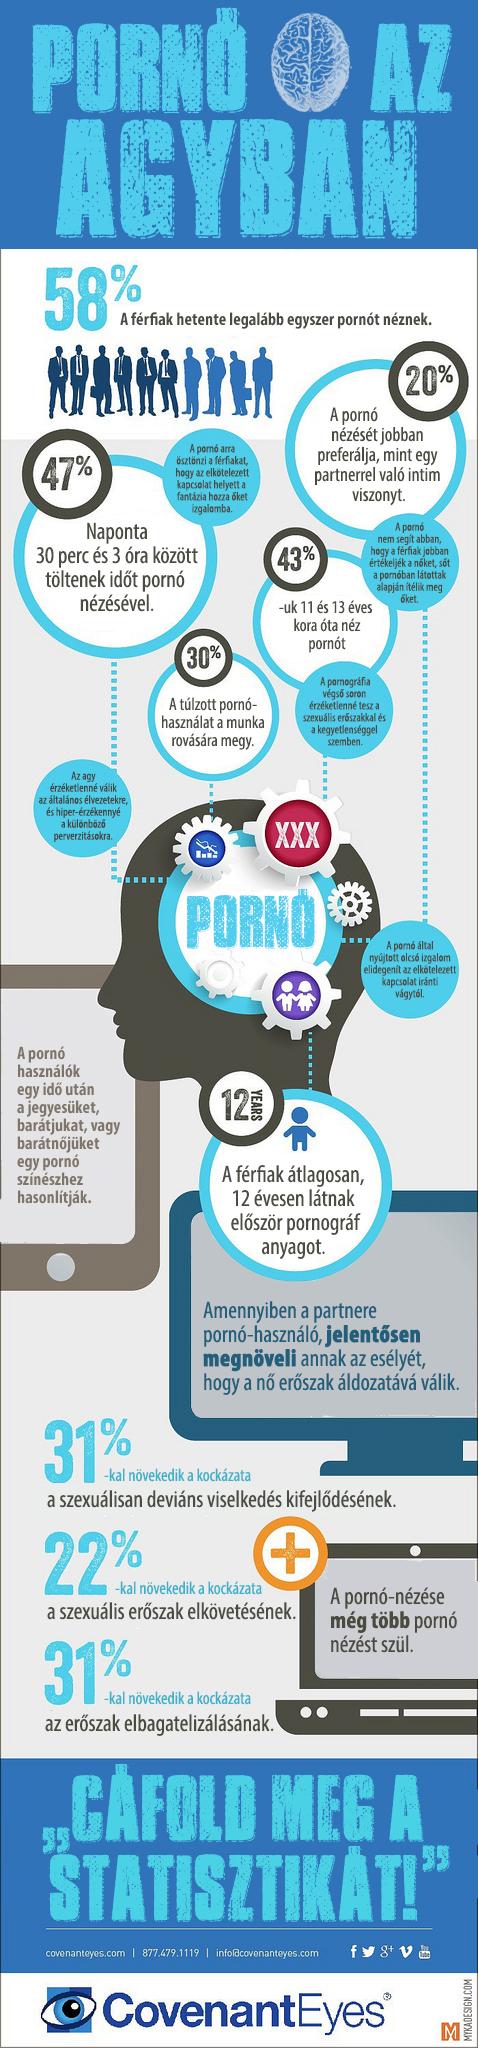 infografika_a_pornografiarol.jpg